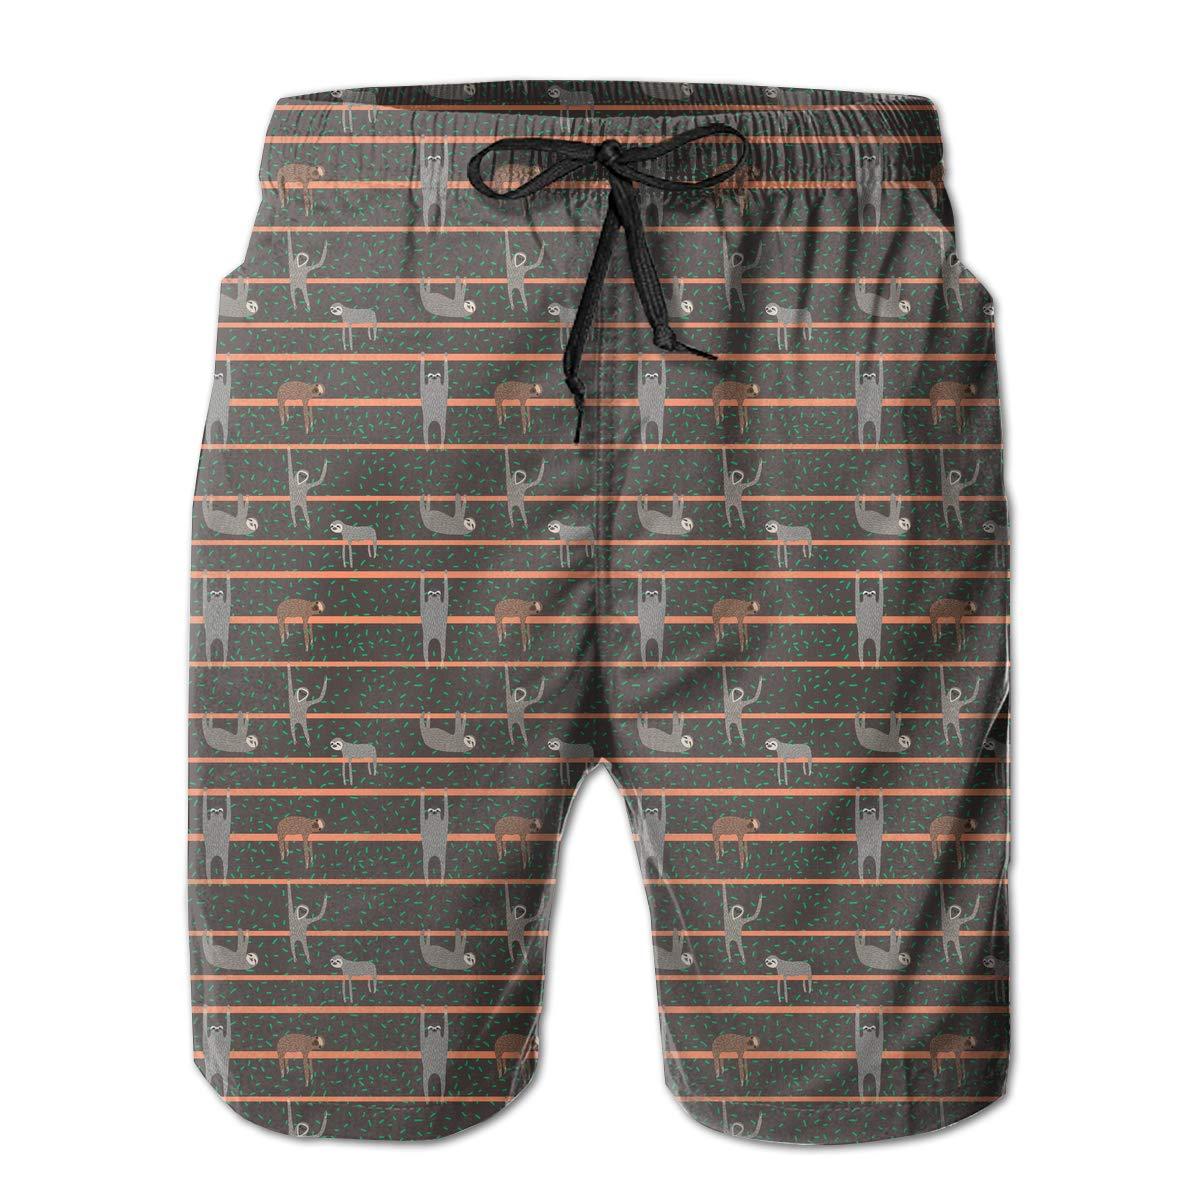 UHT28DG Cartoon Sloths Pattern Mens Printing Beach Board Shorts Drawstring Pockets Bathing Suit